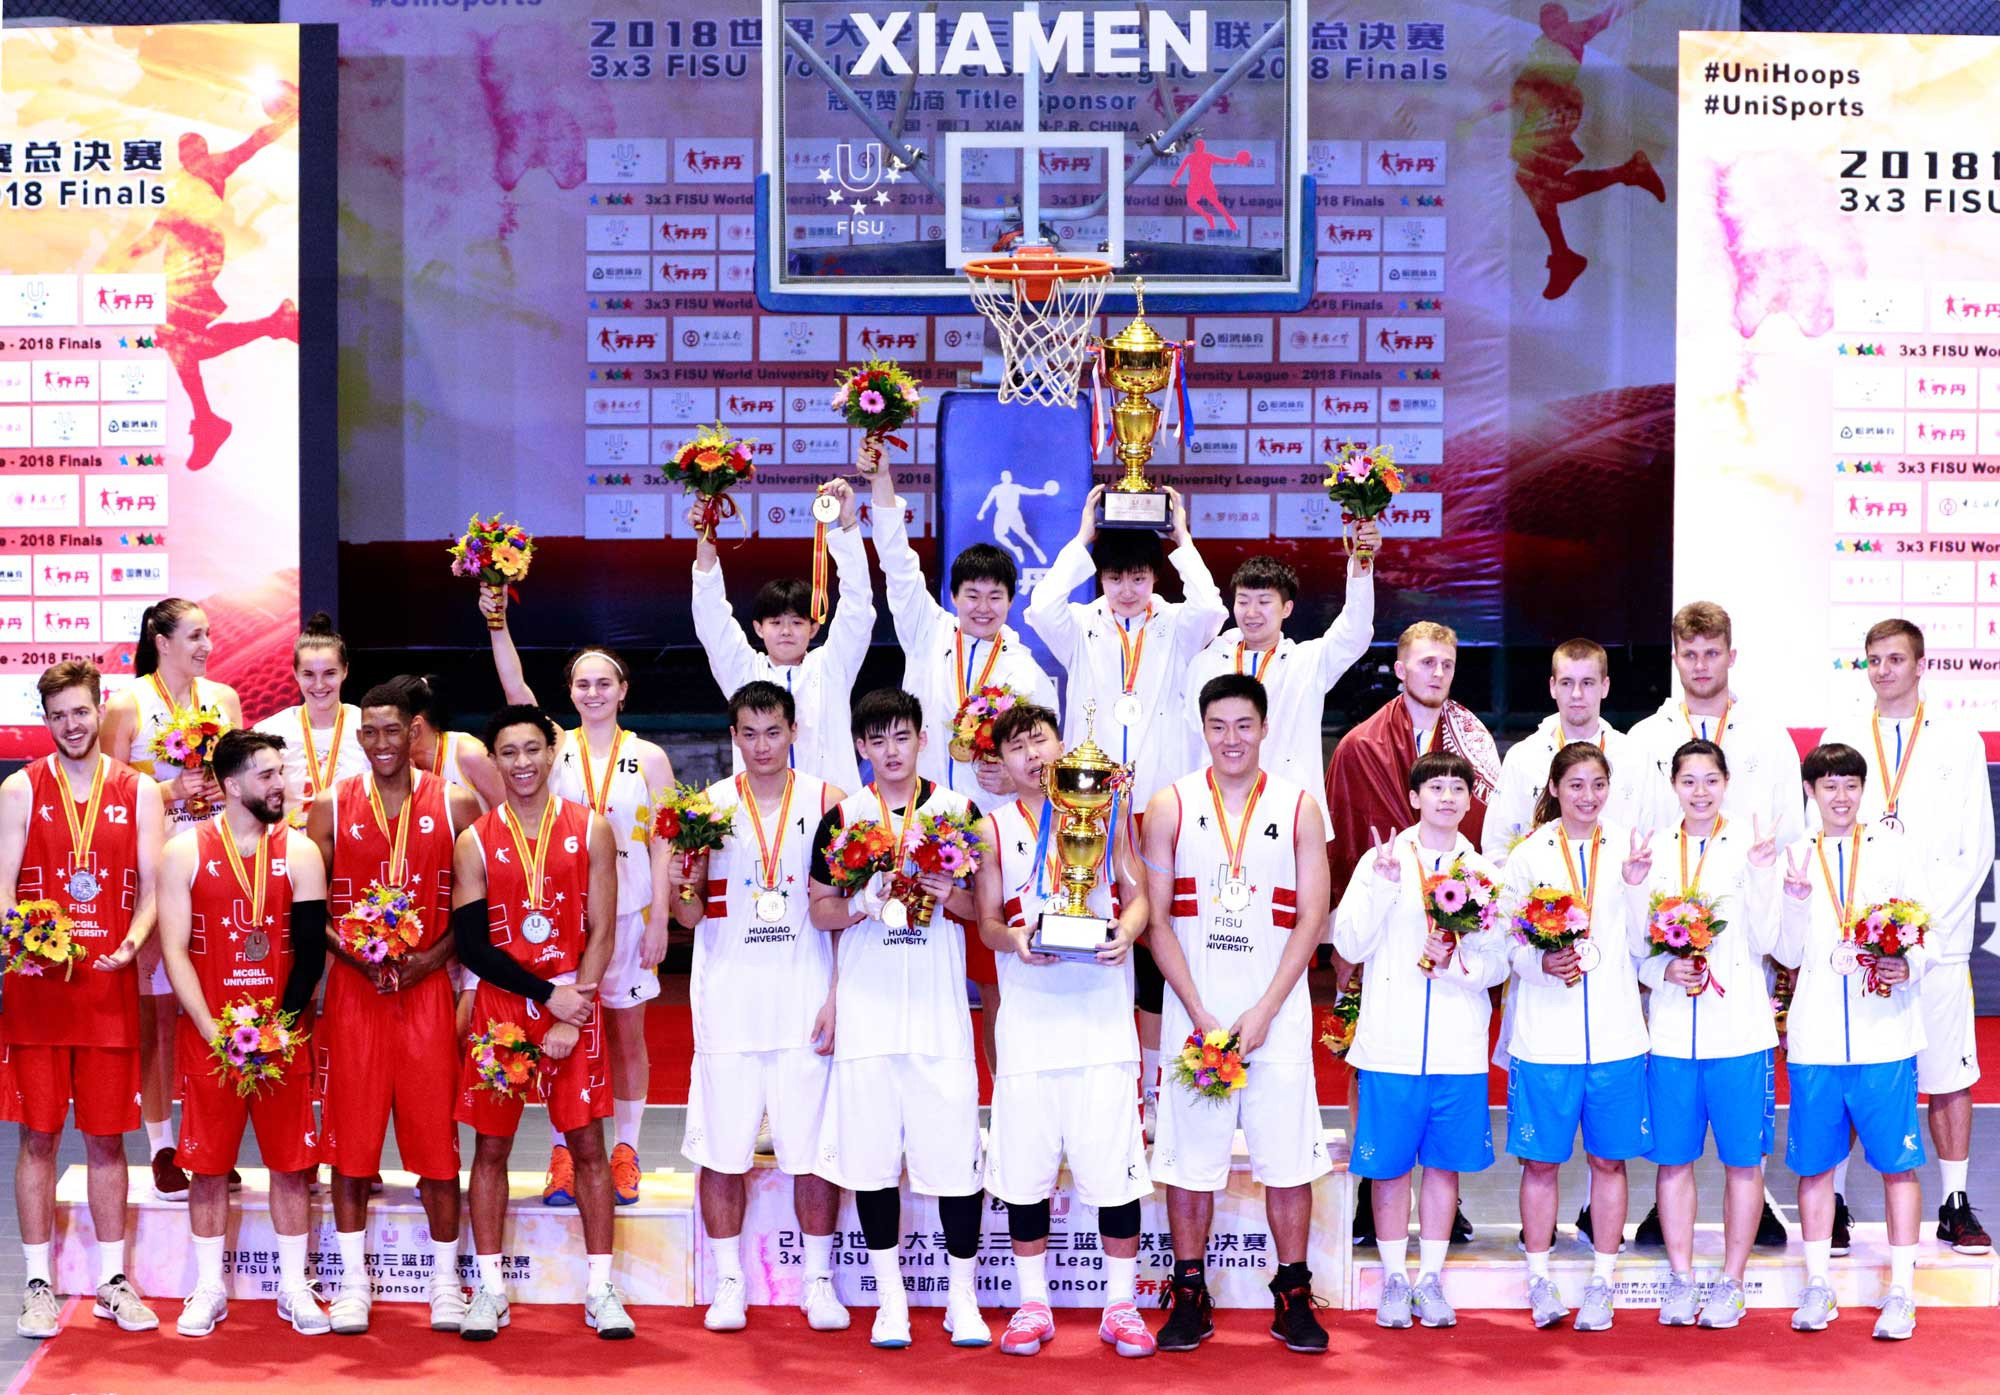 FISU and FIBA organise the 3x3 FISU World University League, which gives the winner a  FIBA 3x3 World Tour berth ©FISU